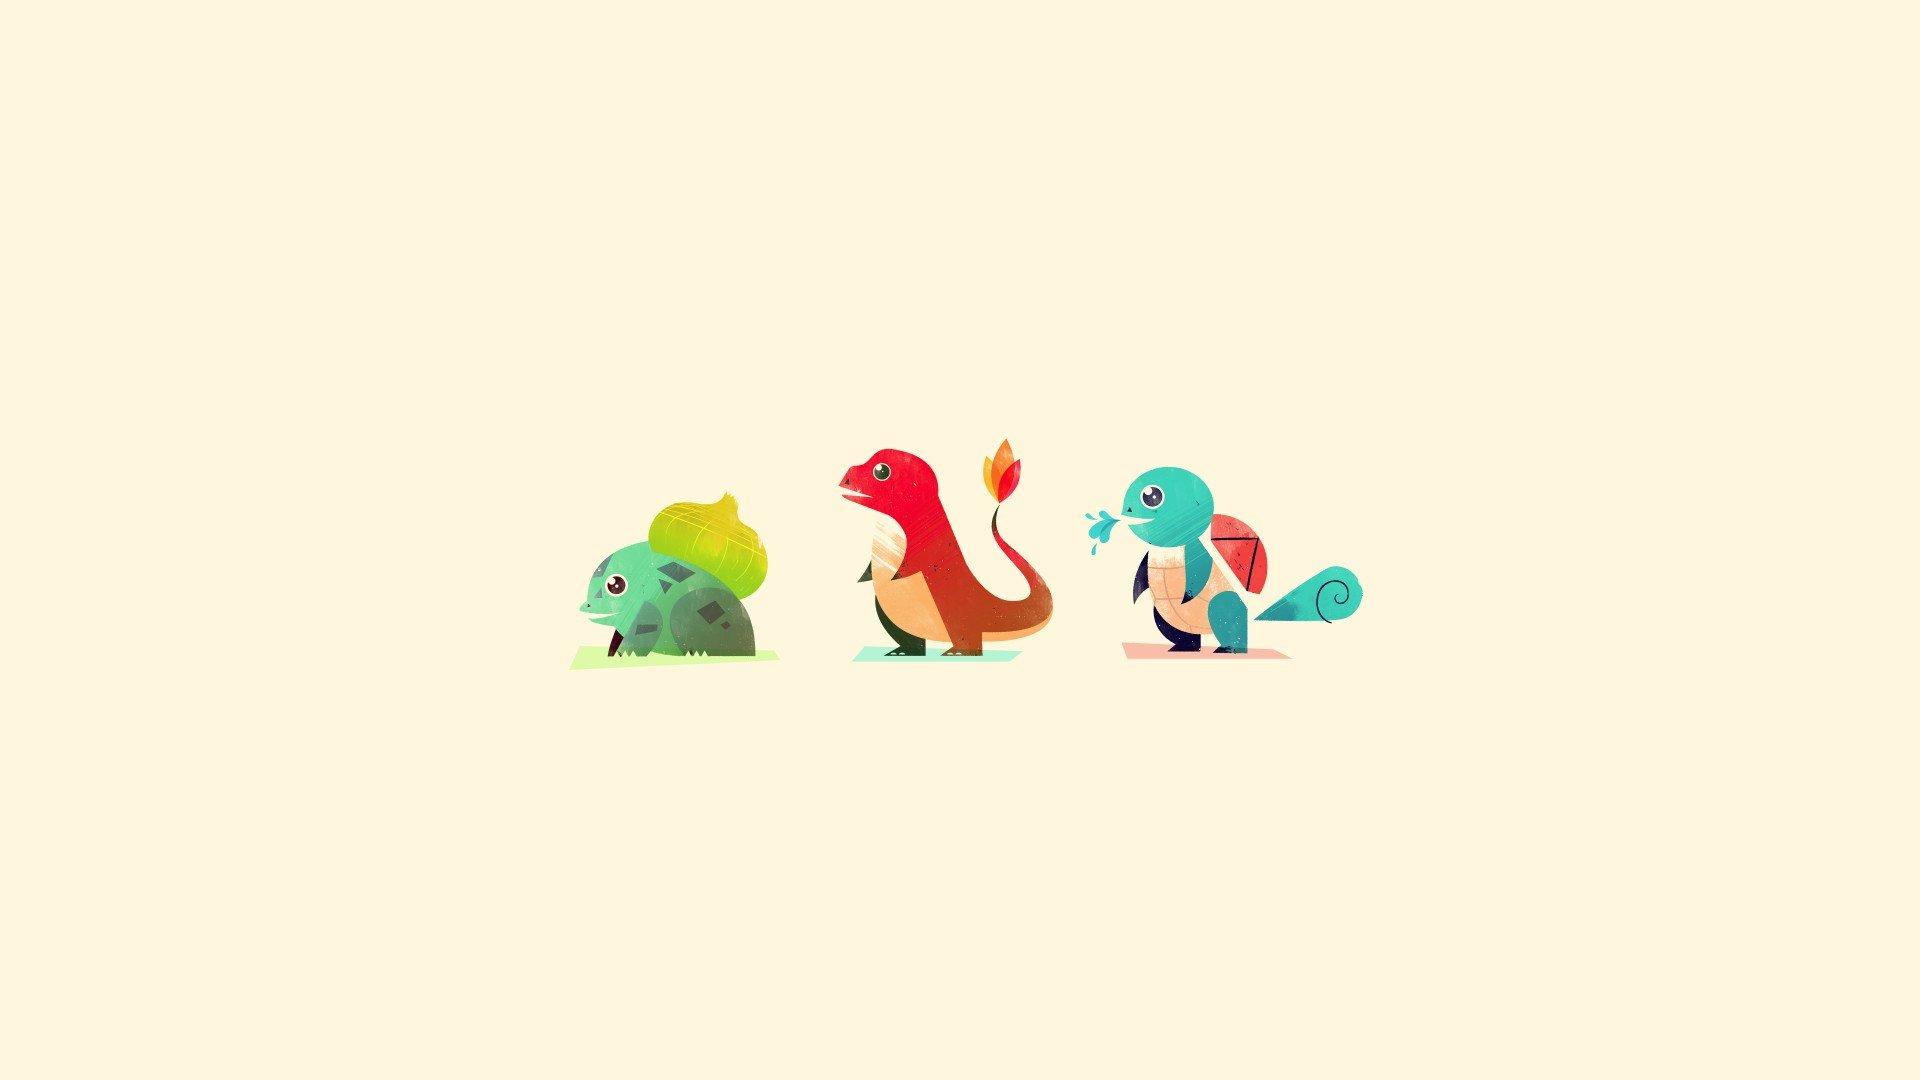 Pokemon, Bulbasaur, Charmander, Squirtle, Minimalism HD